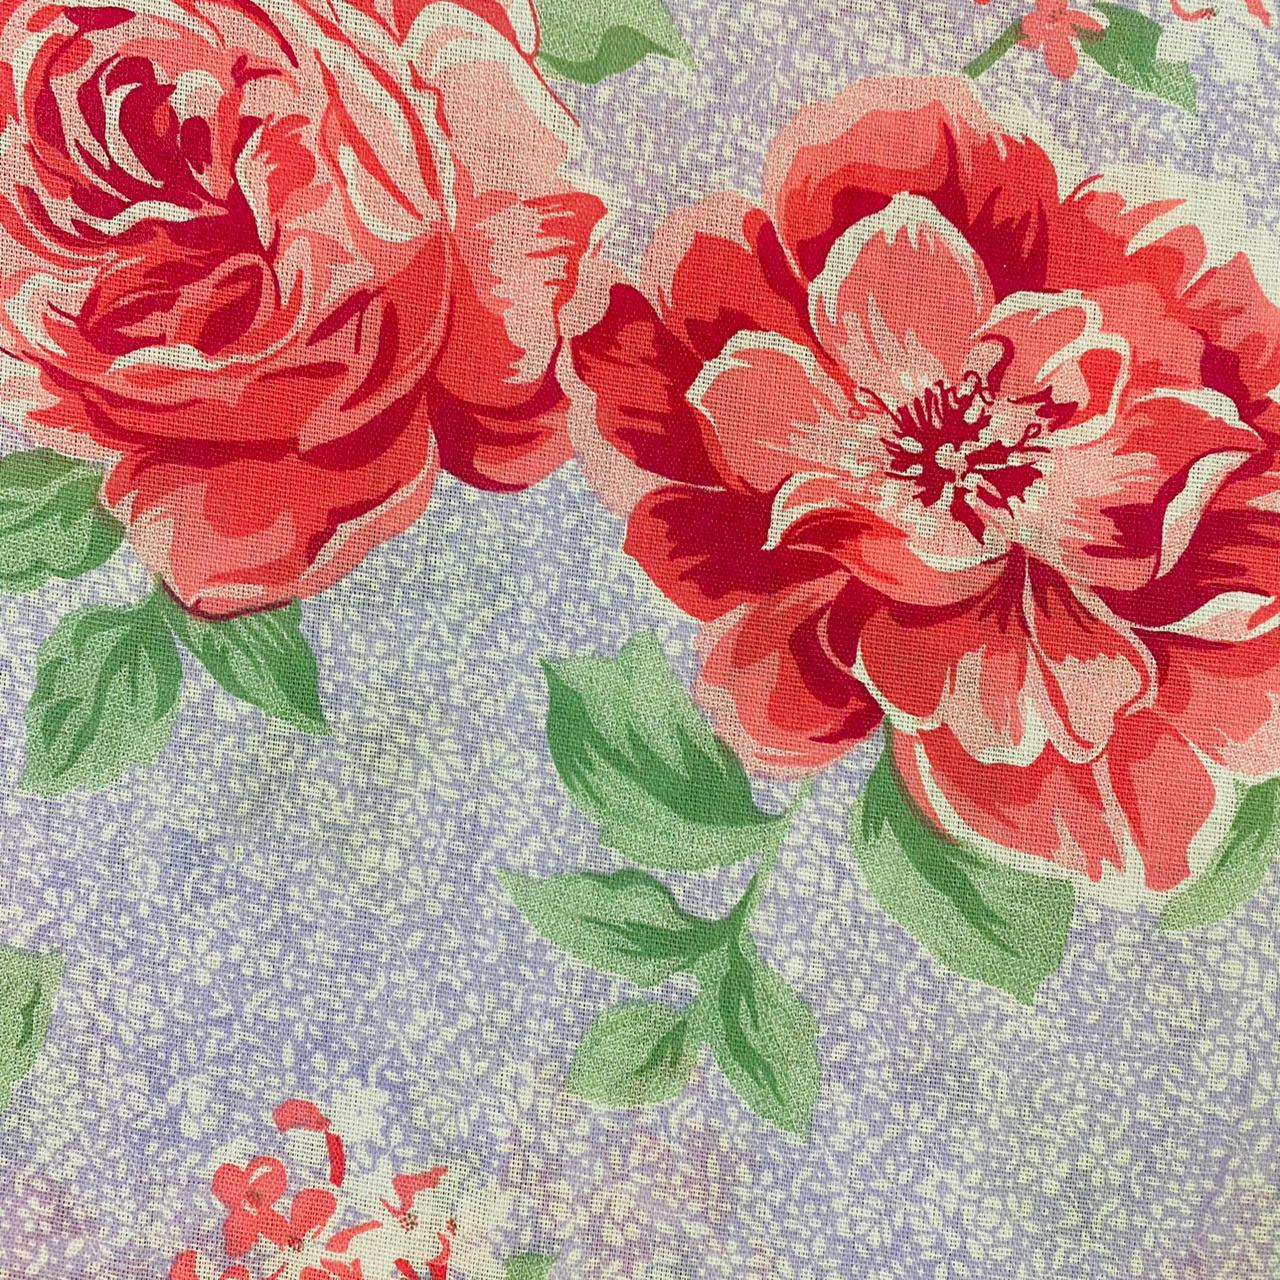 Lençol Misto Floral fundo Lilás 2,20m Largura